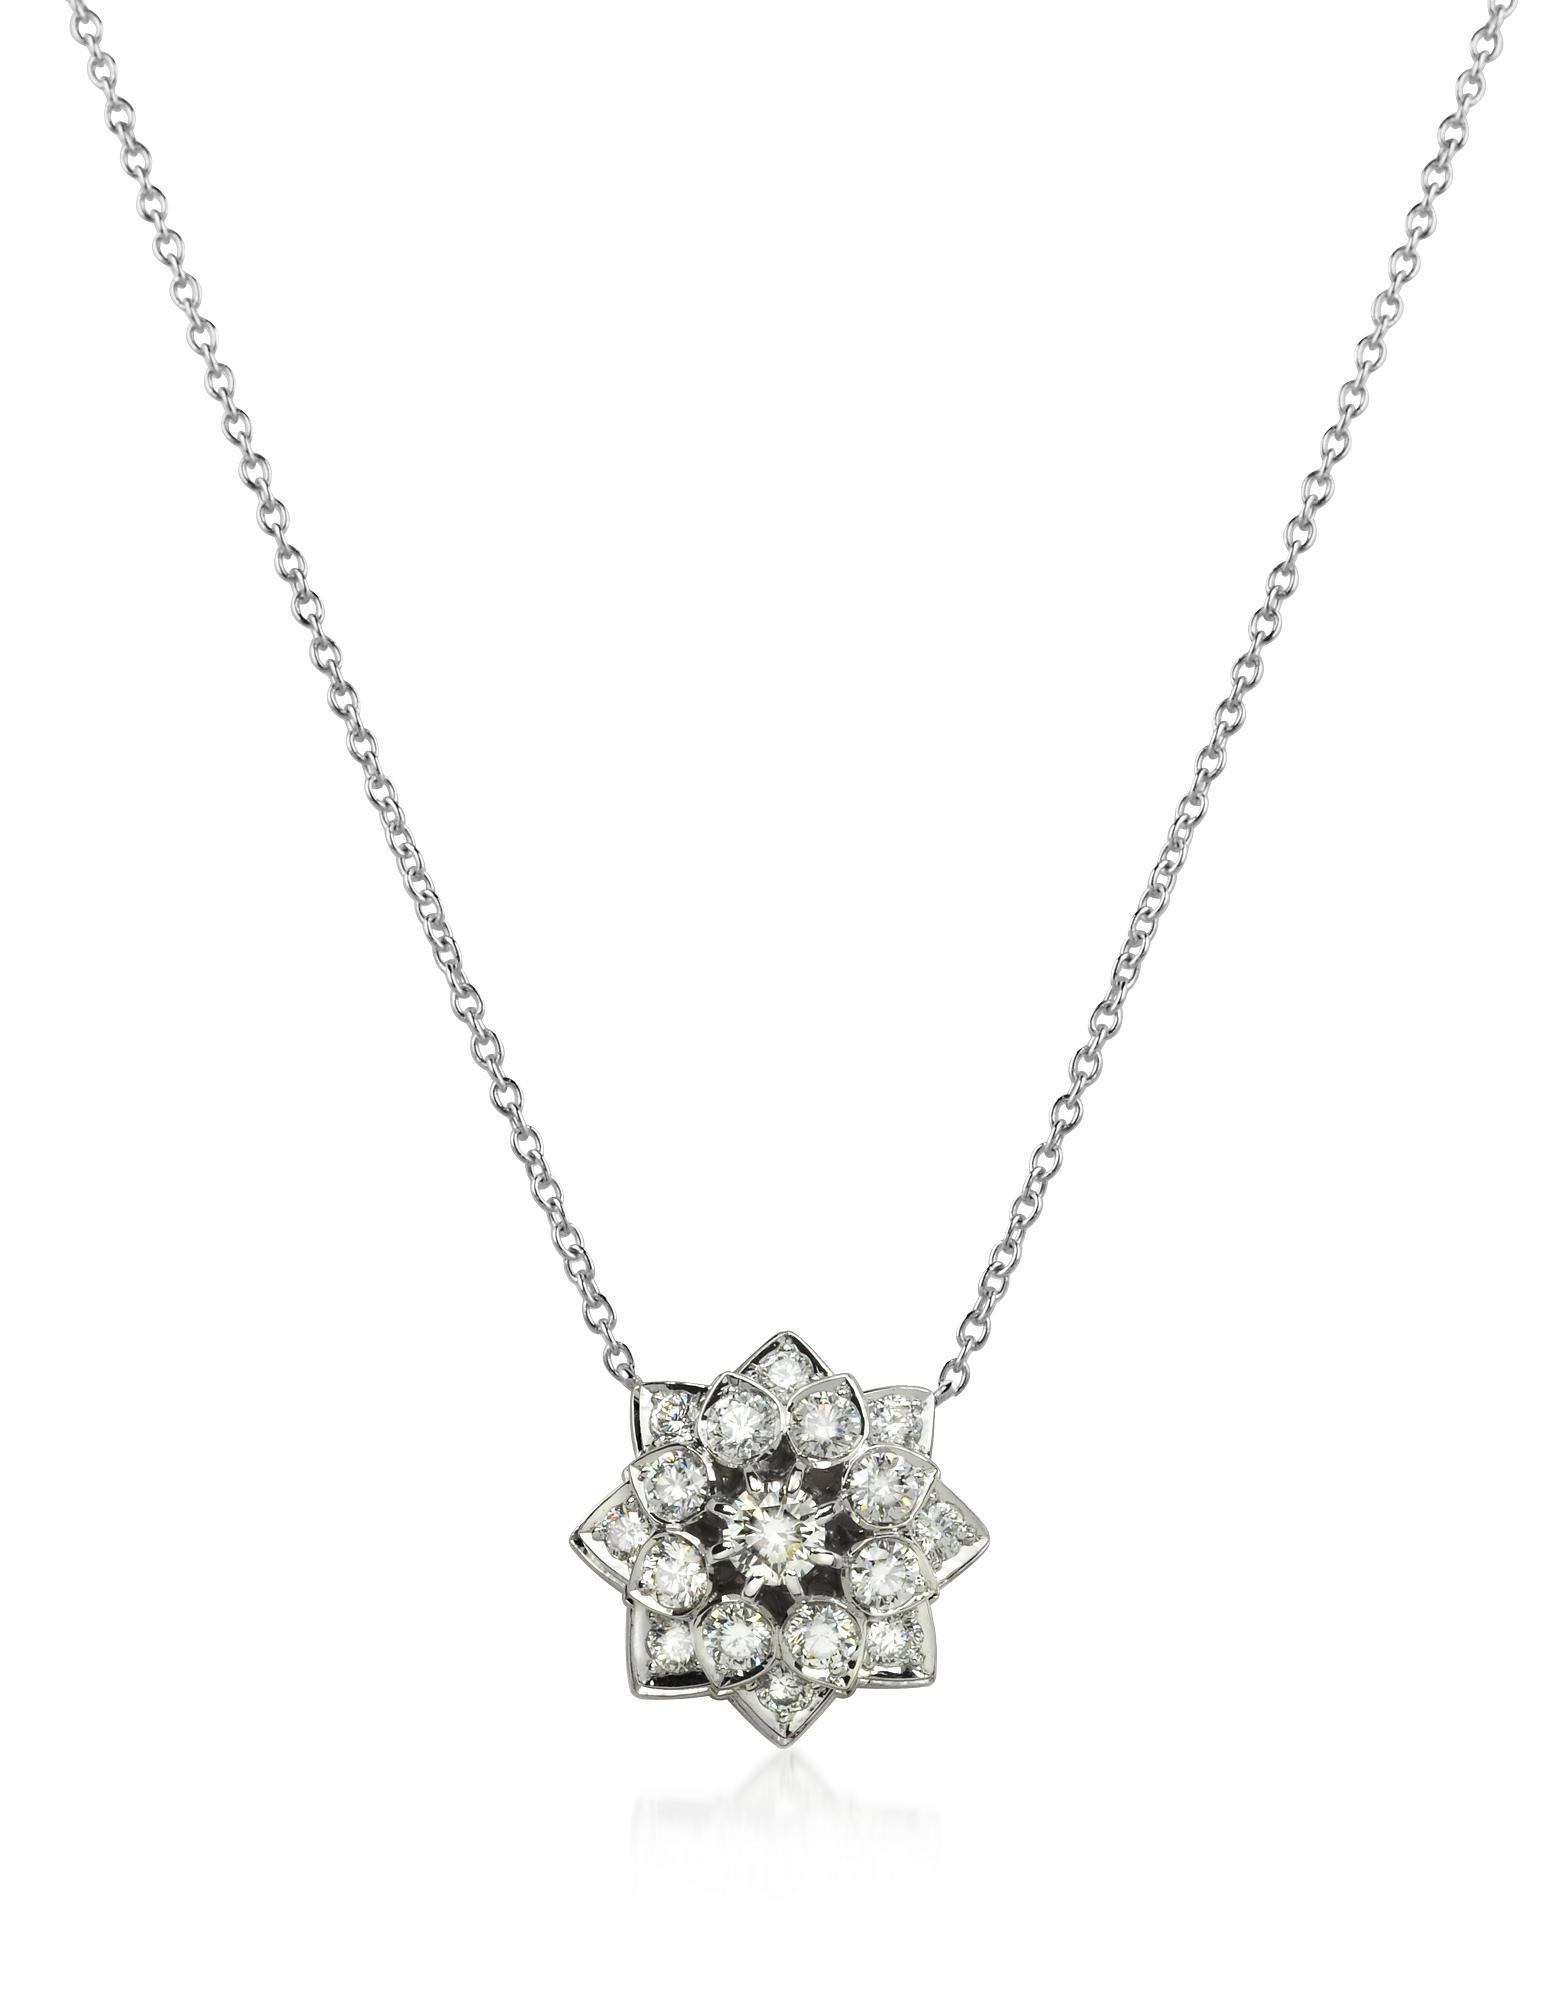 Incanto Royale Ожерелье из Золота 18 карат с Бриллиантами 1.35 карат